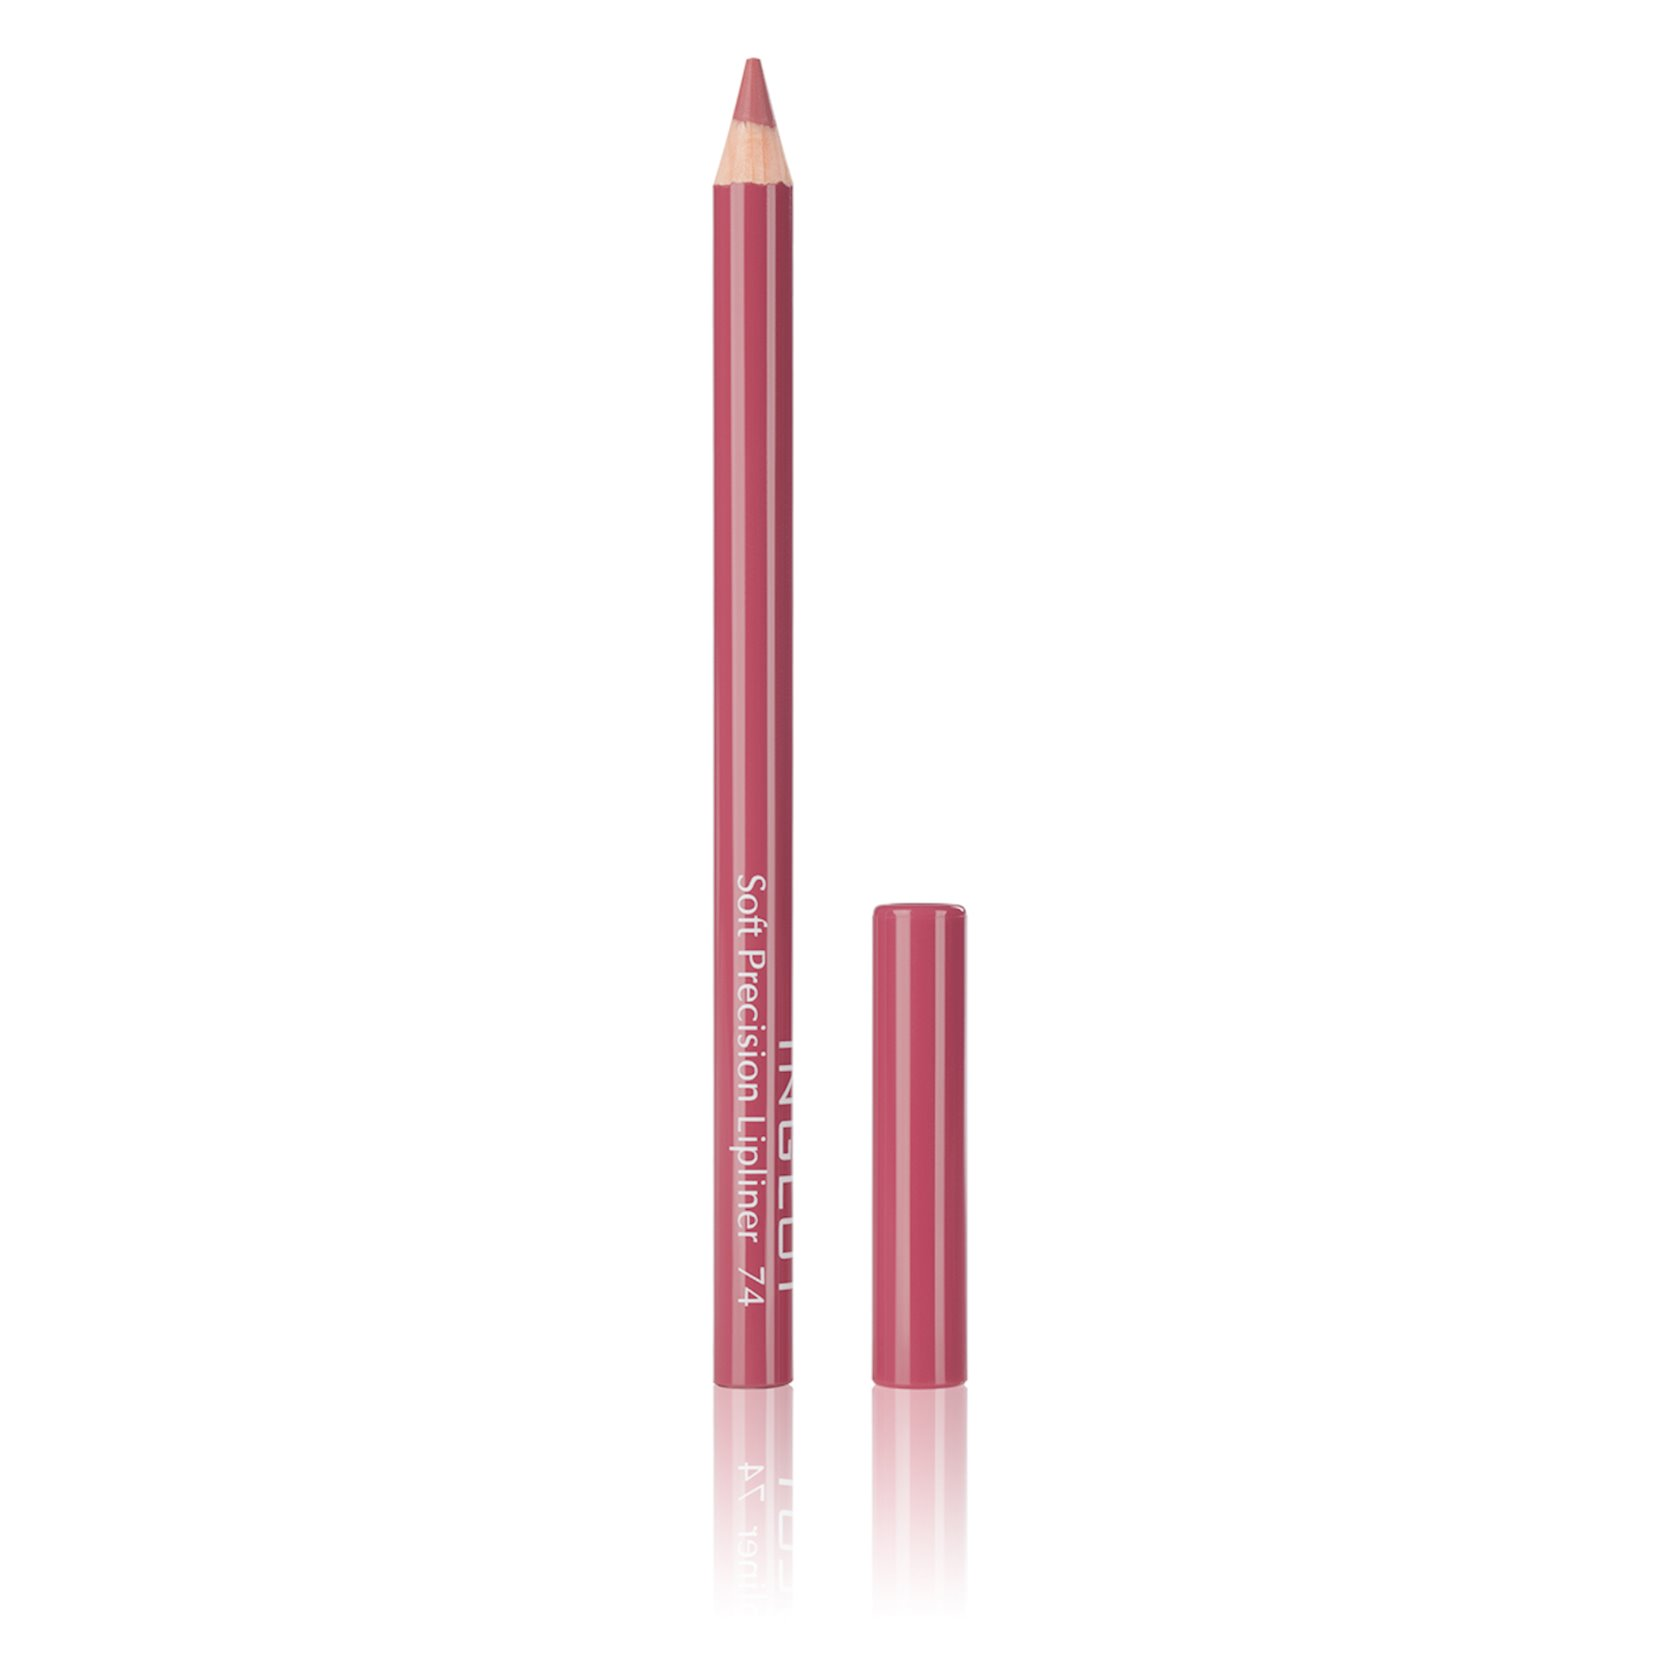 Dodaq makiyajı üçün dəst Inglot Makeup Set for Lips Pink Rose Satin